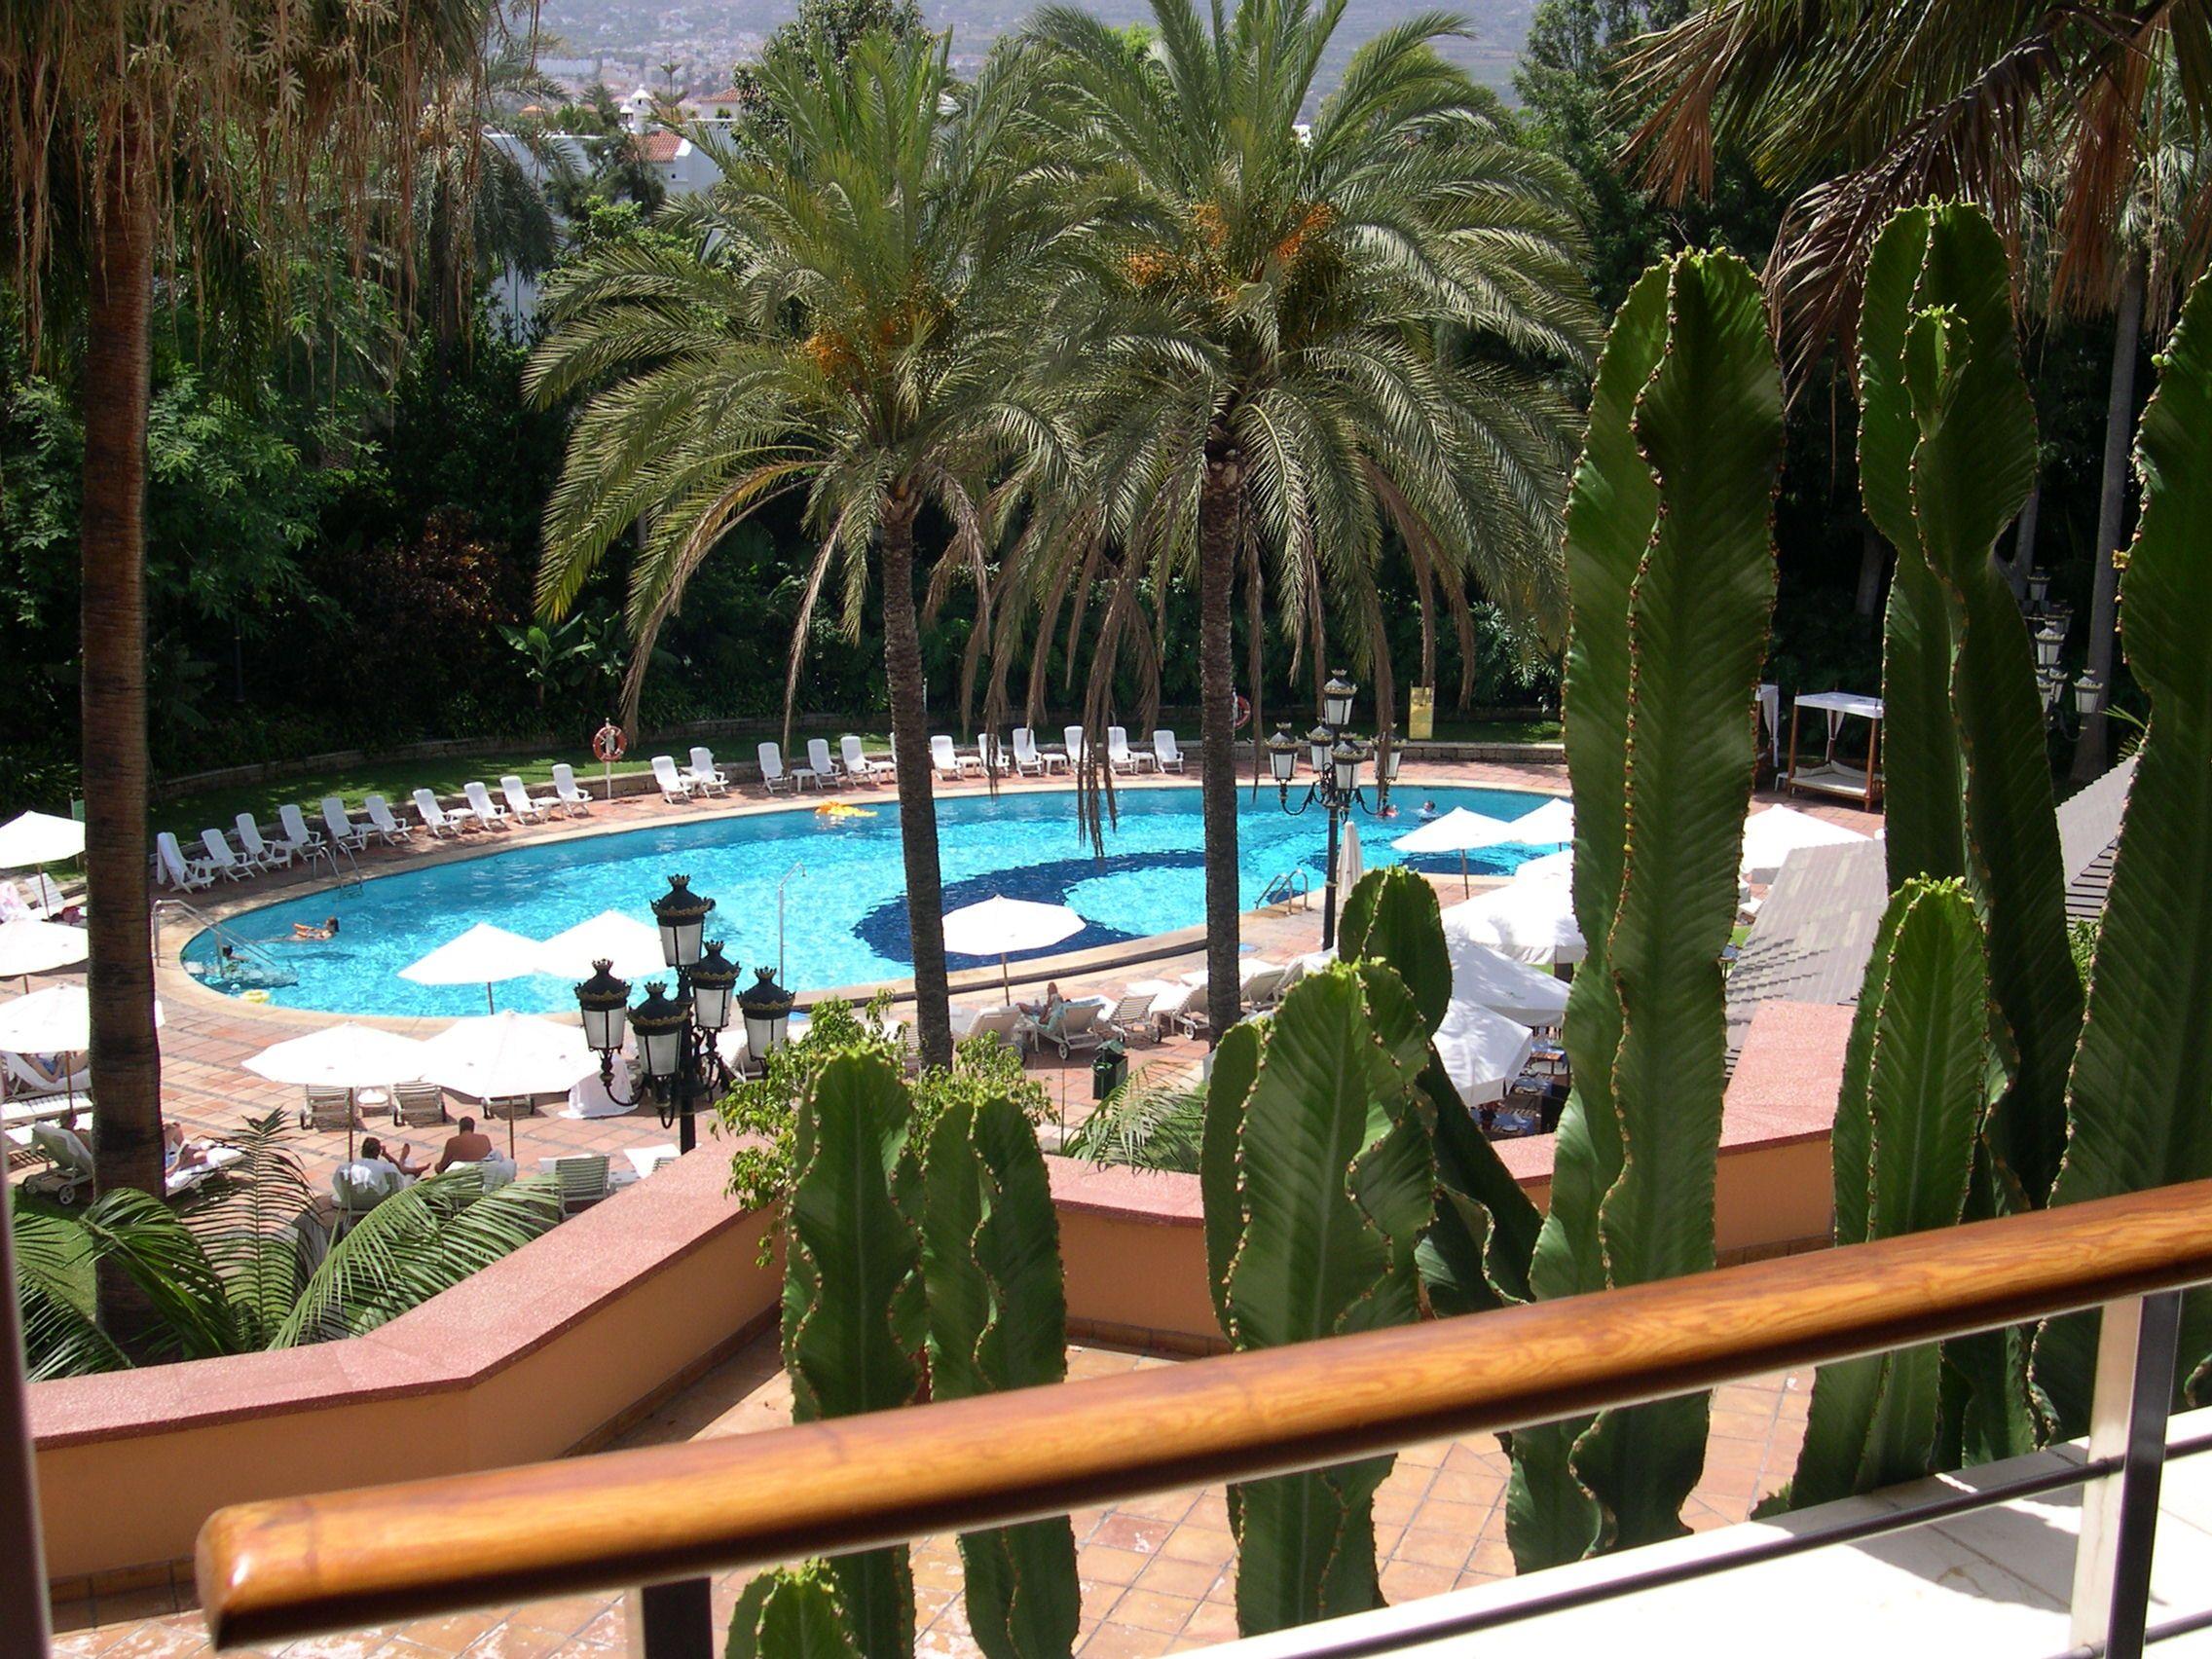 Hotel Botánico (Puerto de la CruzTenerife) Spa breaks